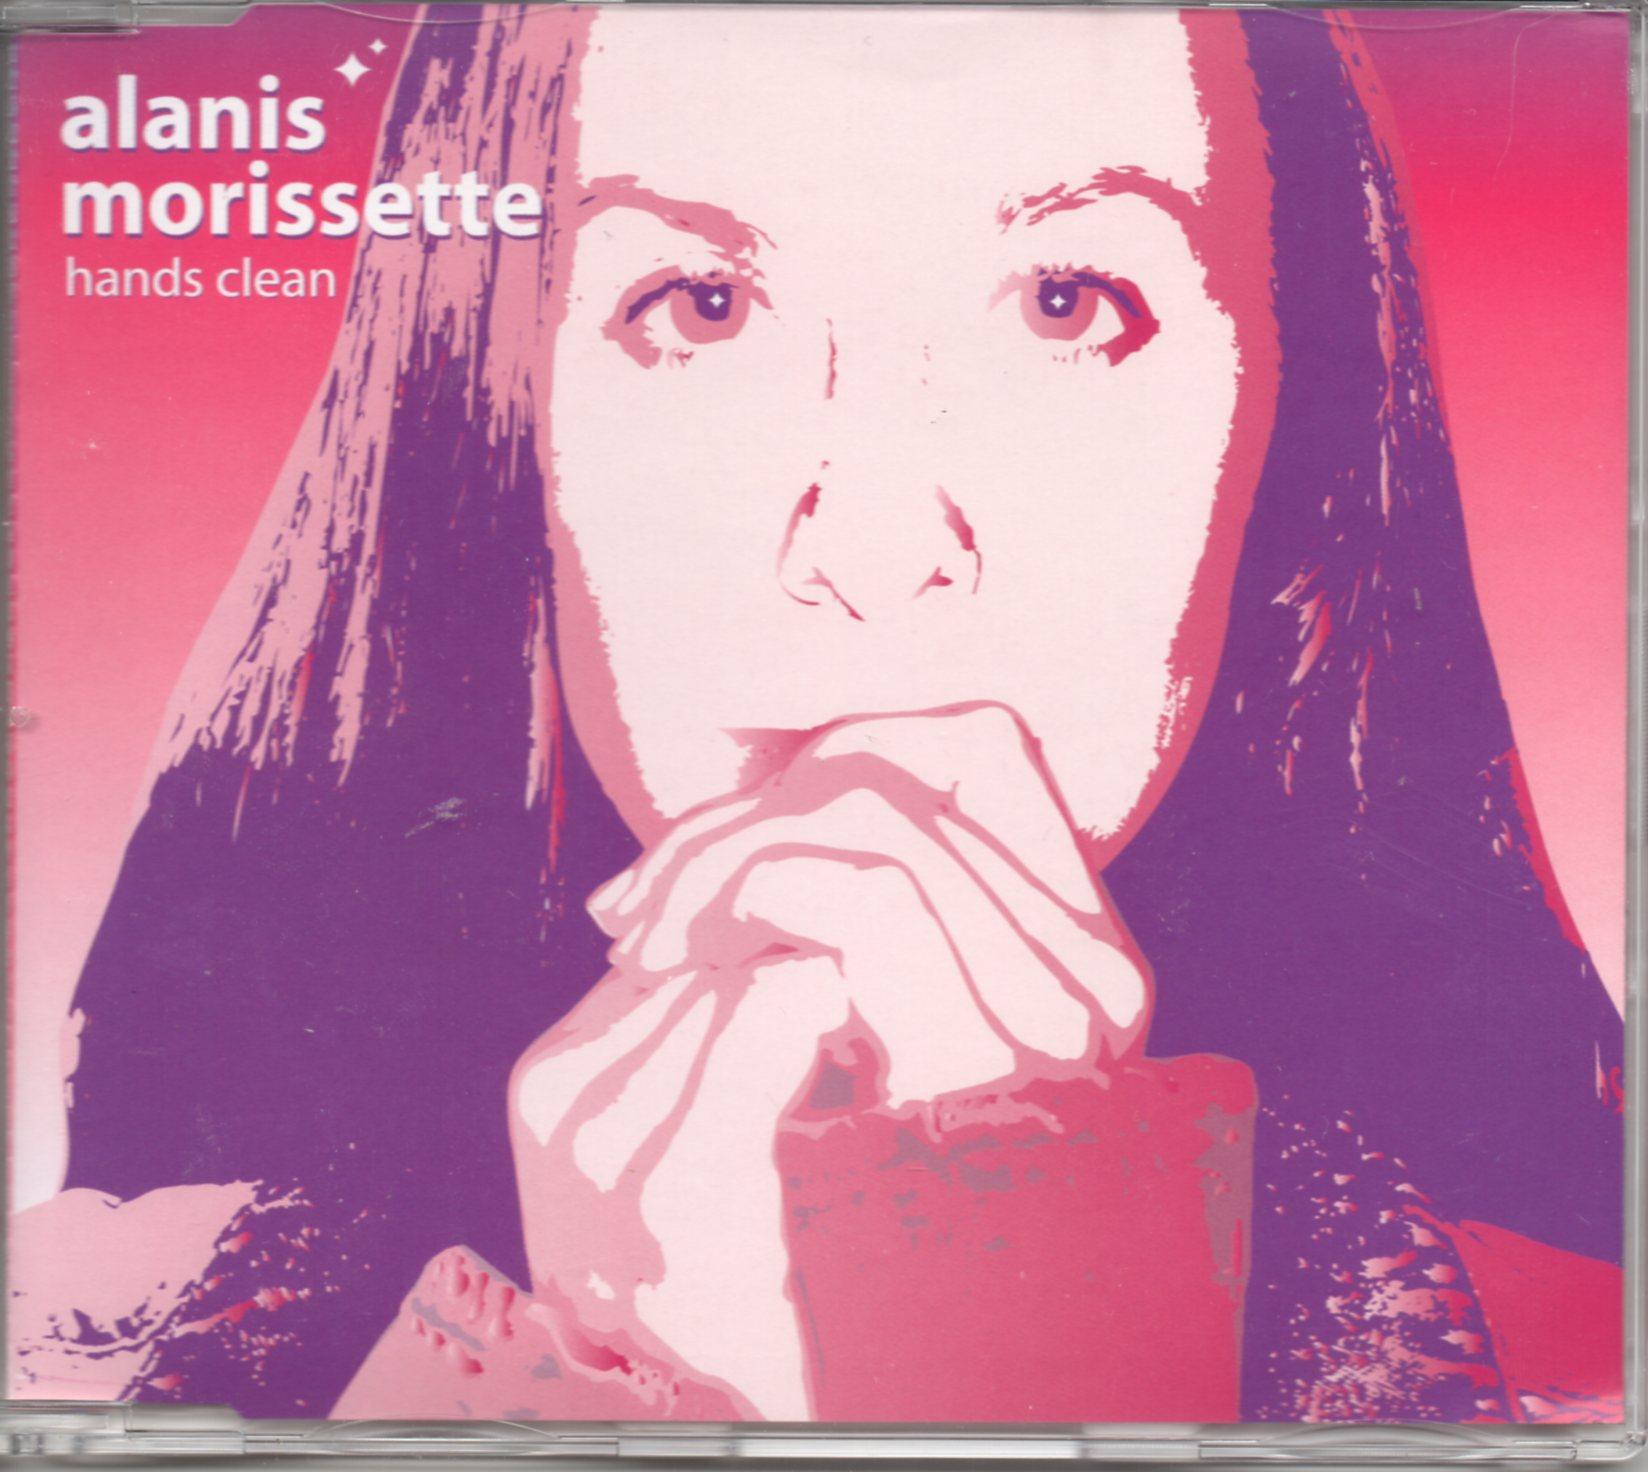 ALANIS MORISSETTE - Hands clean Promo 1-track Jewel Case - MCD